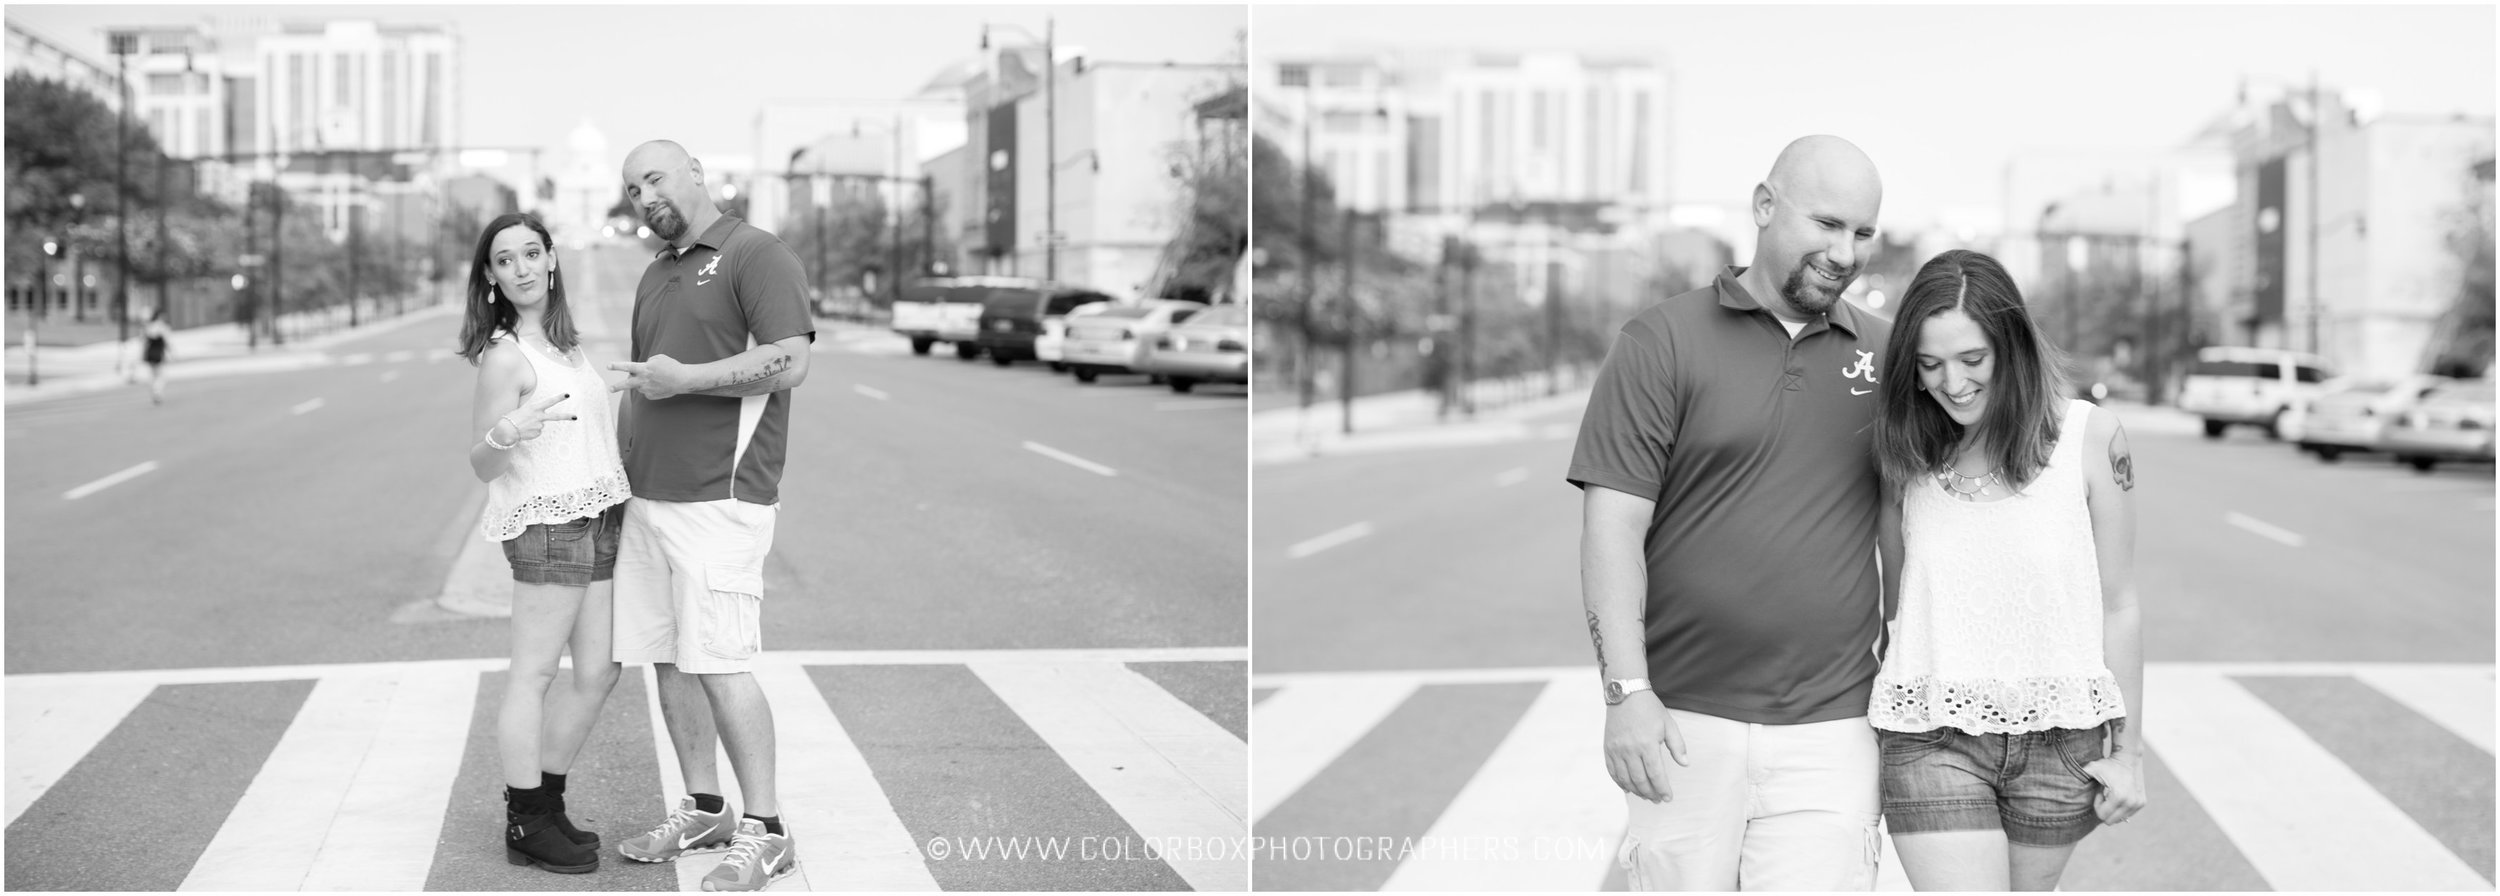 colorboxphotographers_4294.jpg